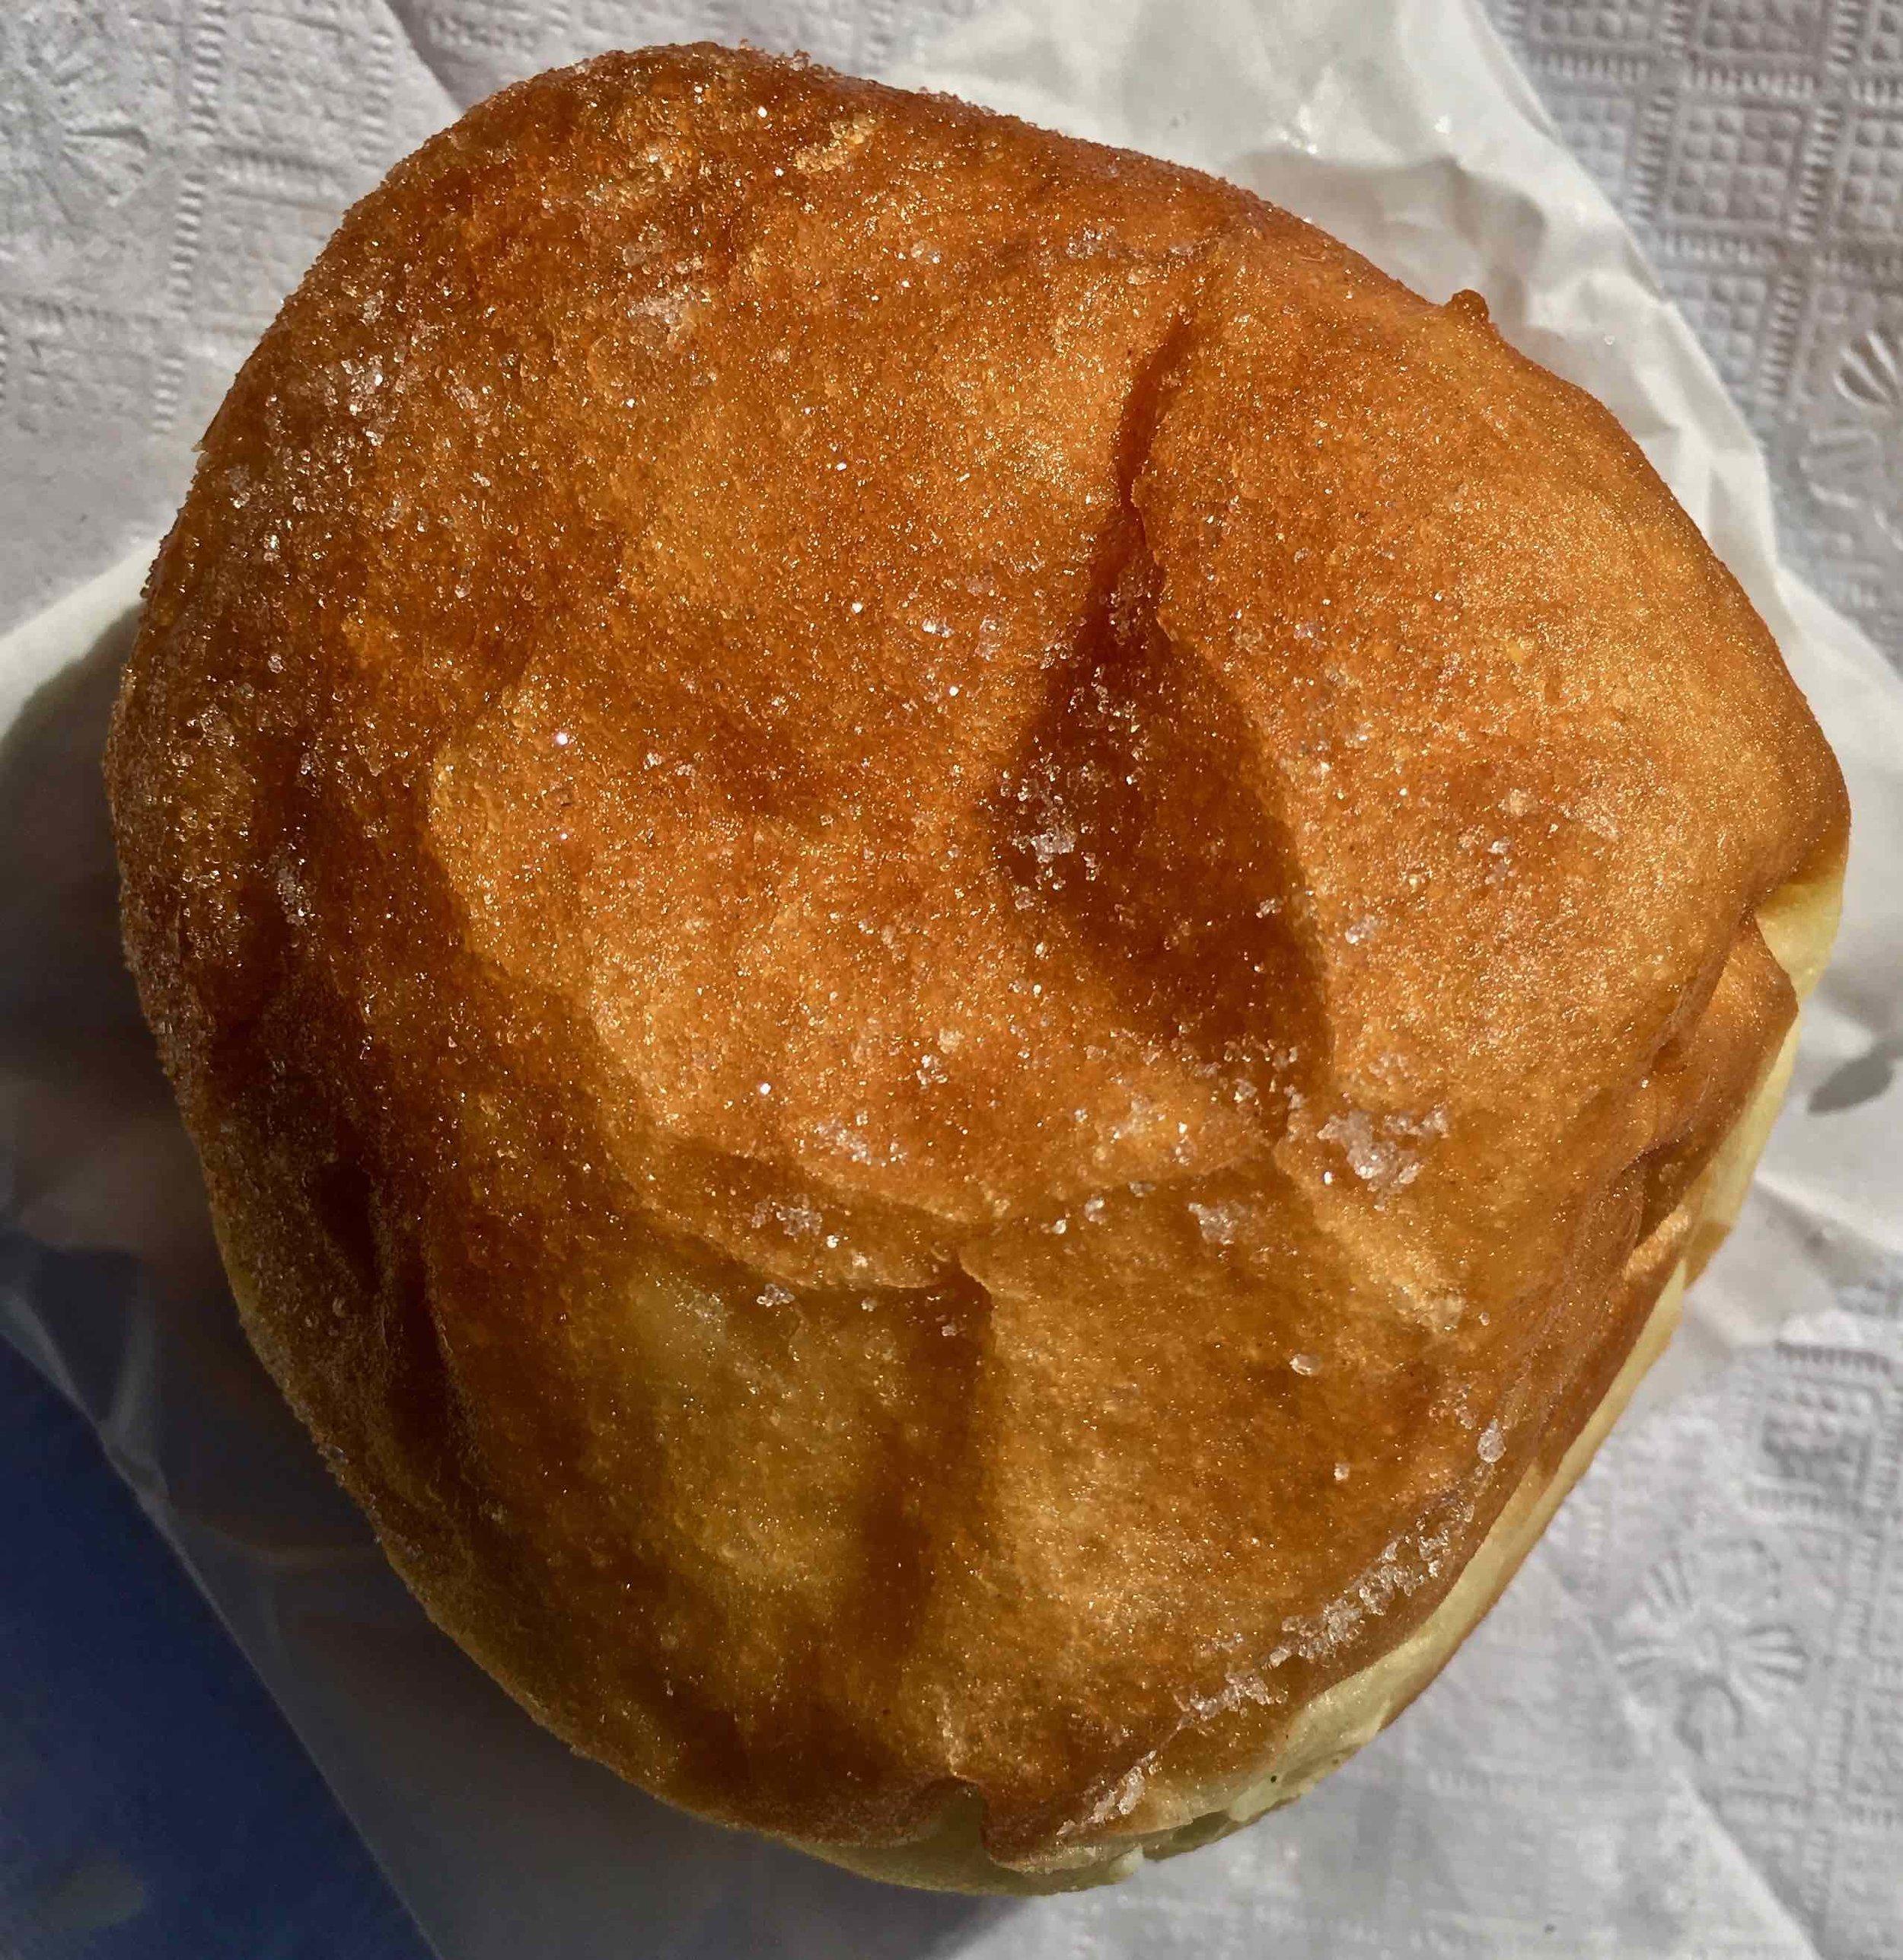 sugared sazerac doughnut